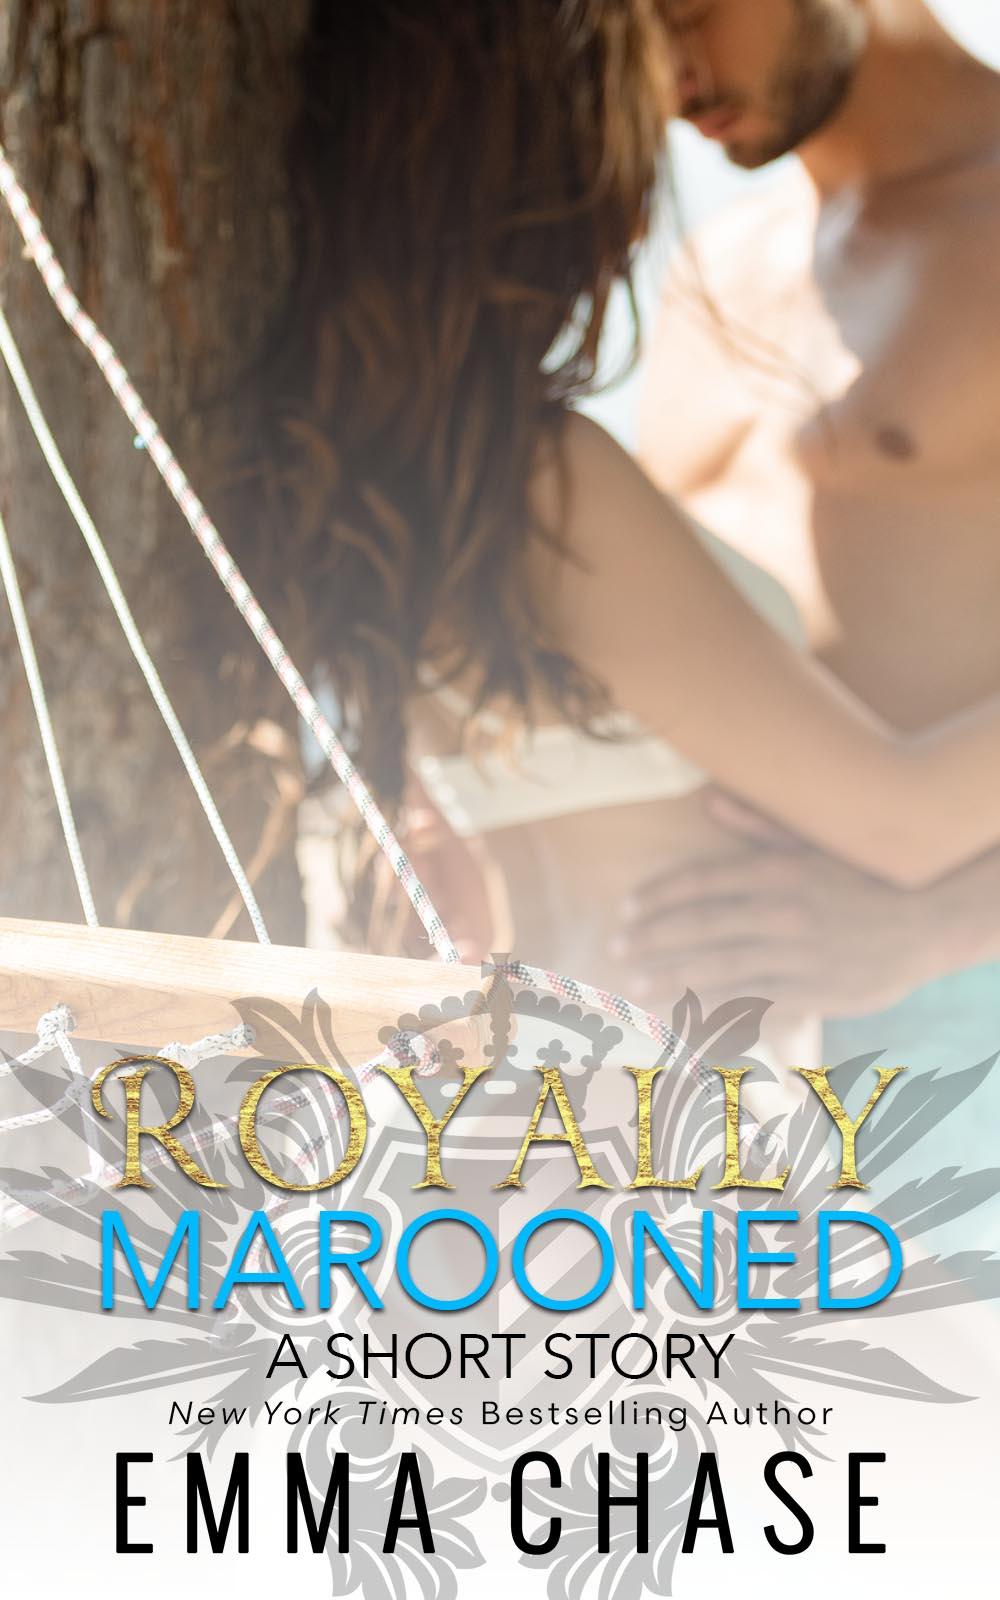 Royally Marooned (Royally, #1.5)